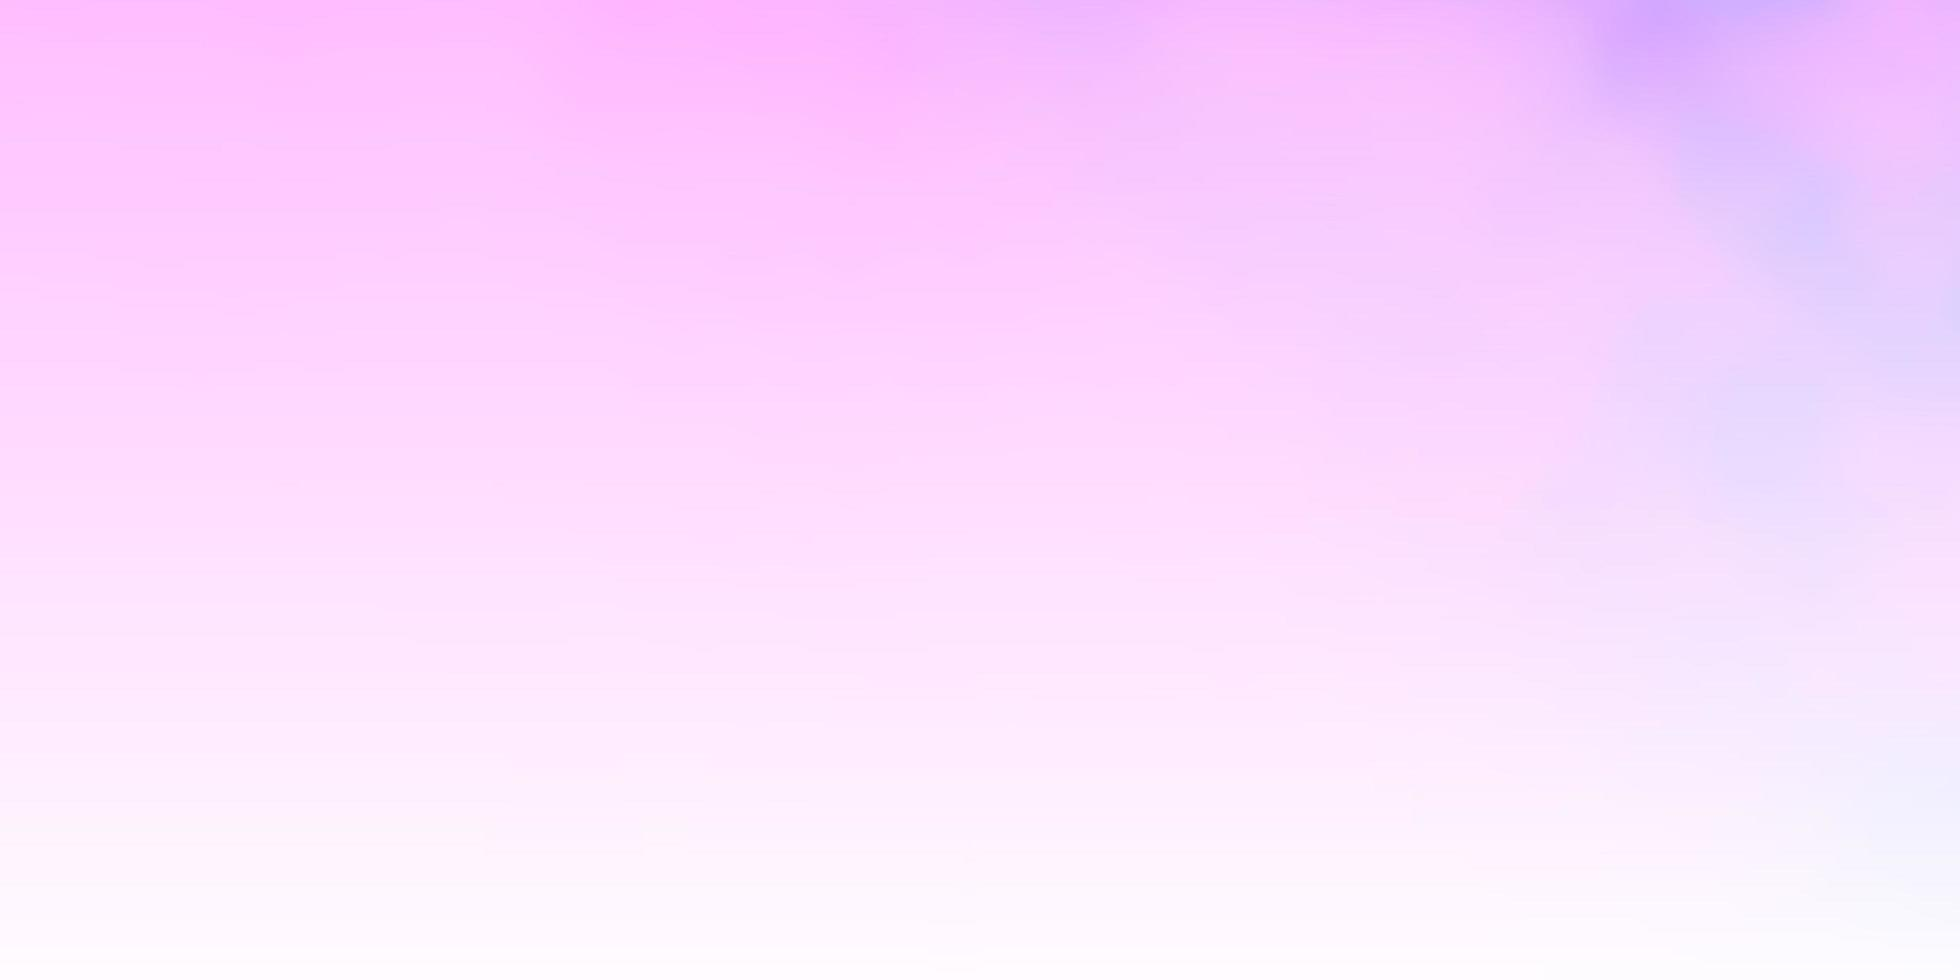 layout de vetor roxo claro, rosa com cloudscape.